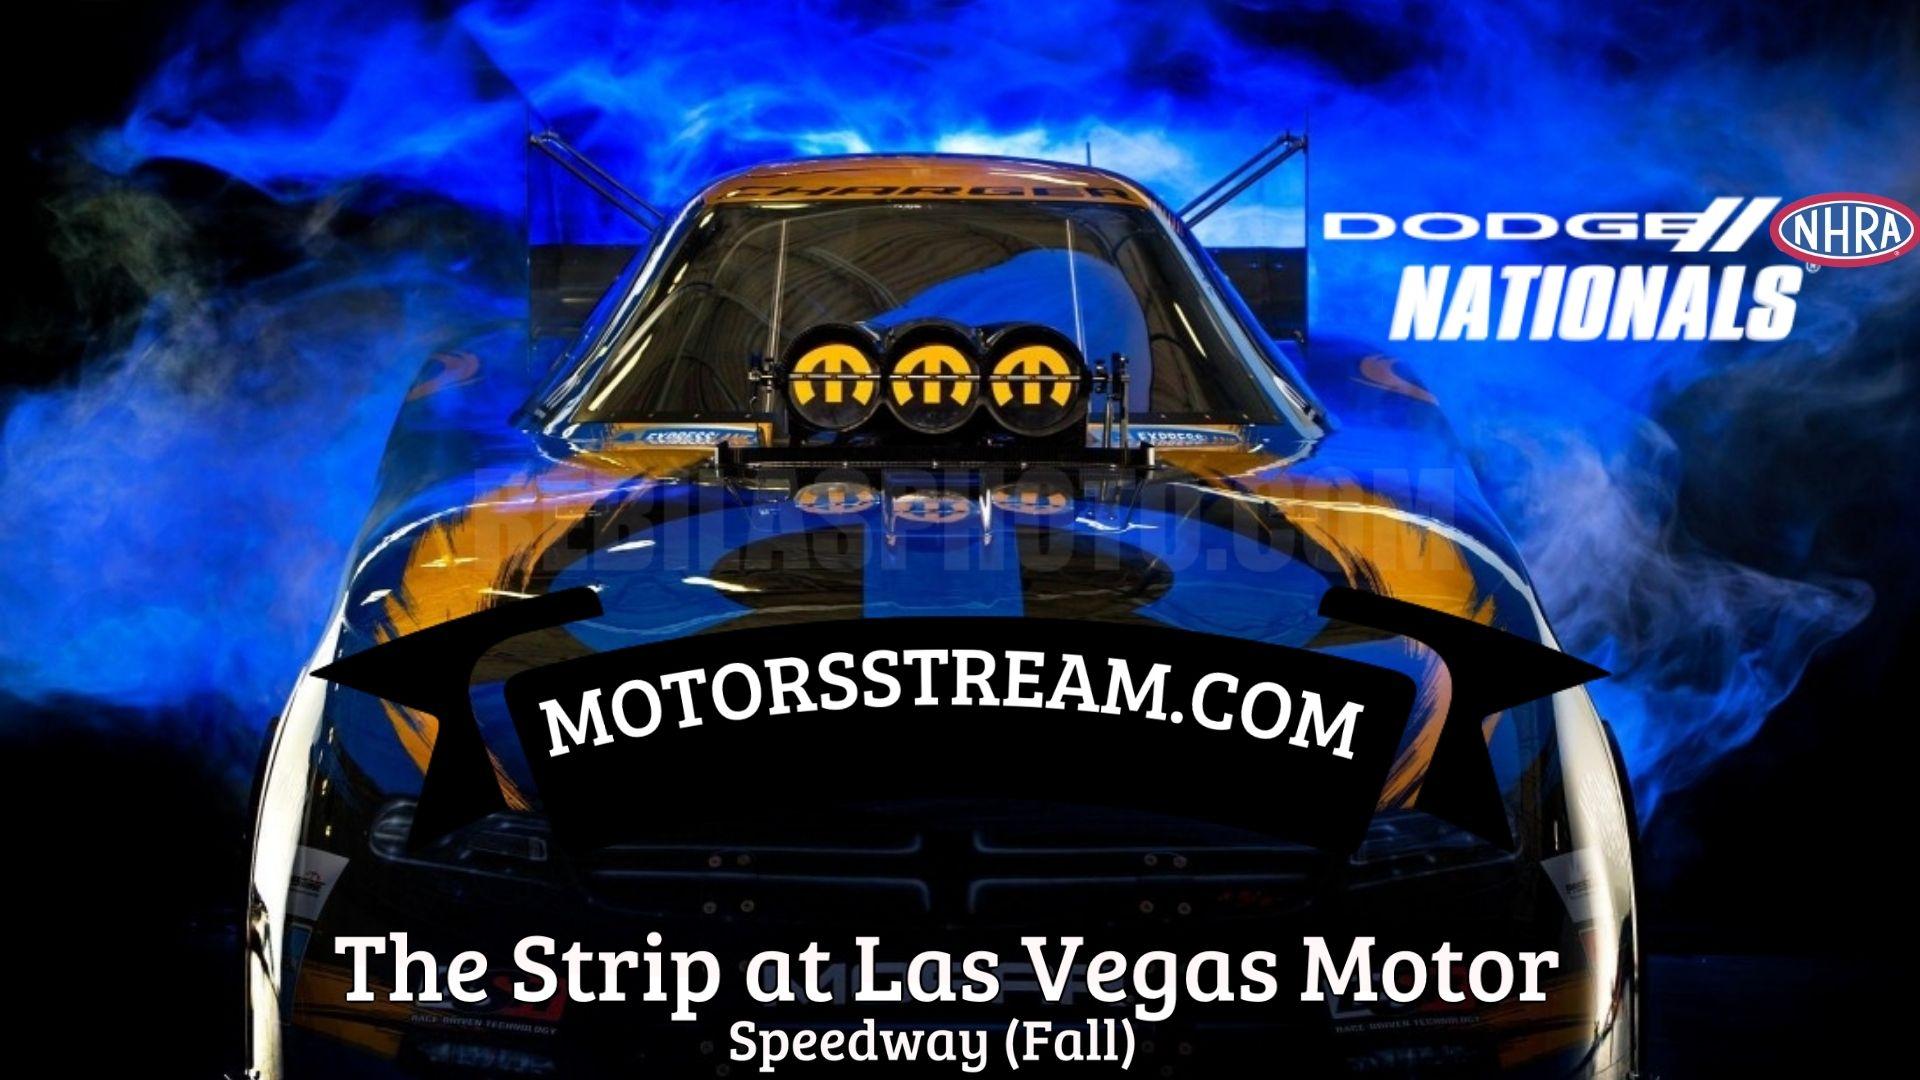 Dodge NHRA Nationals 2021 Live Stream